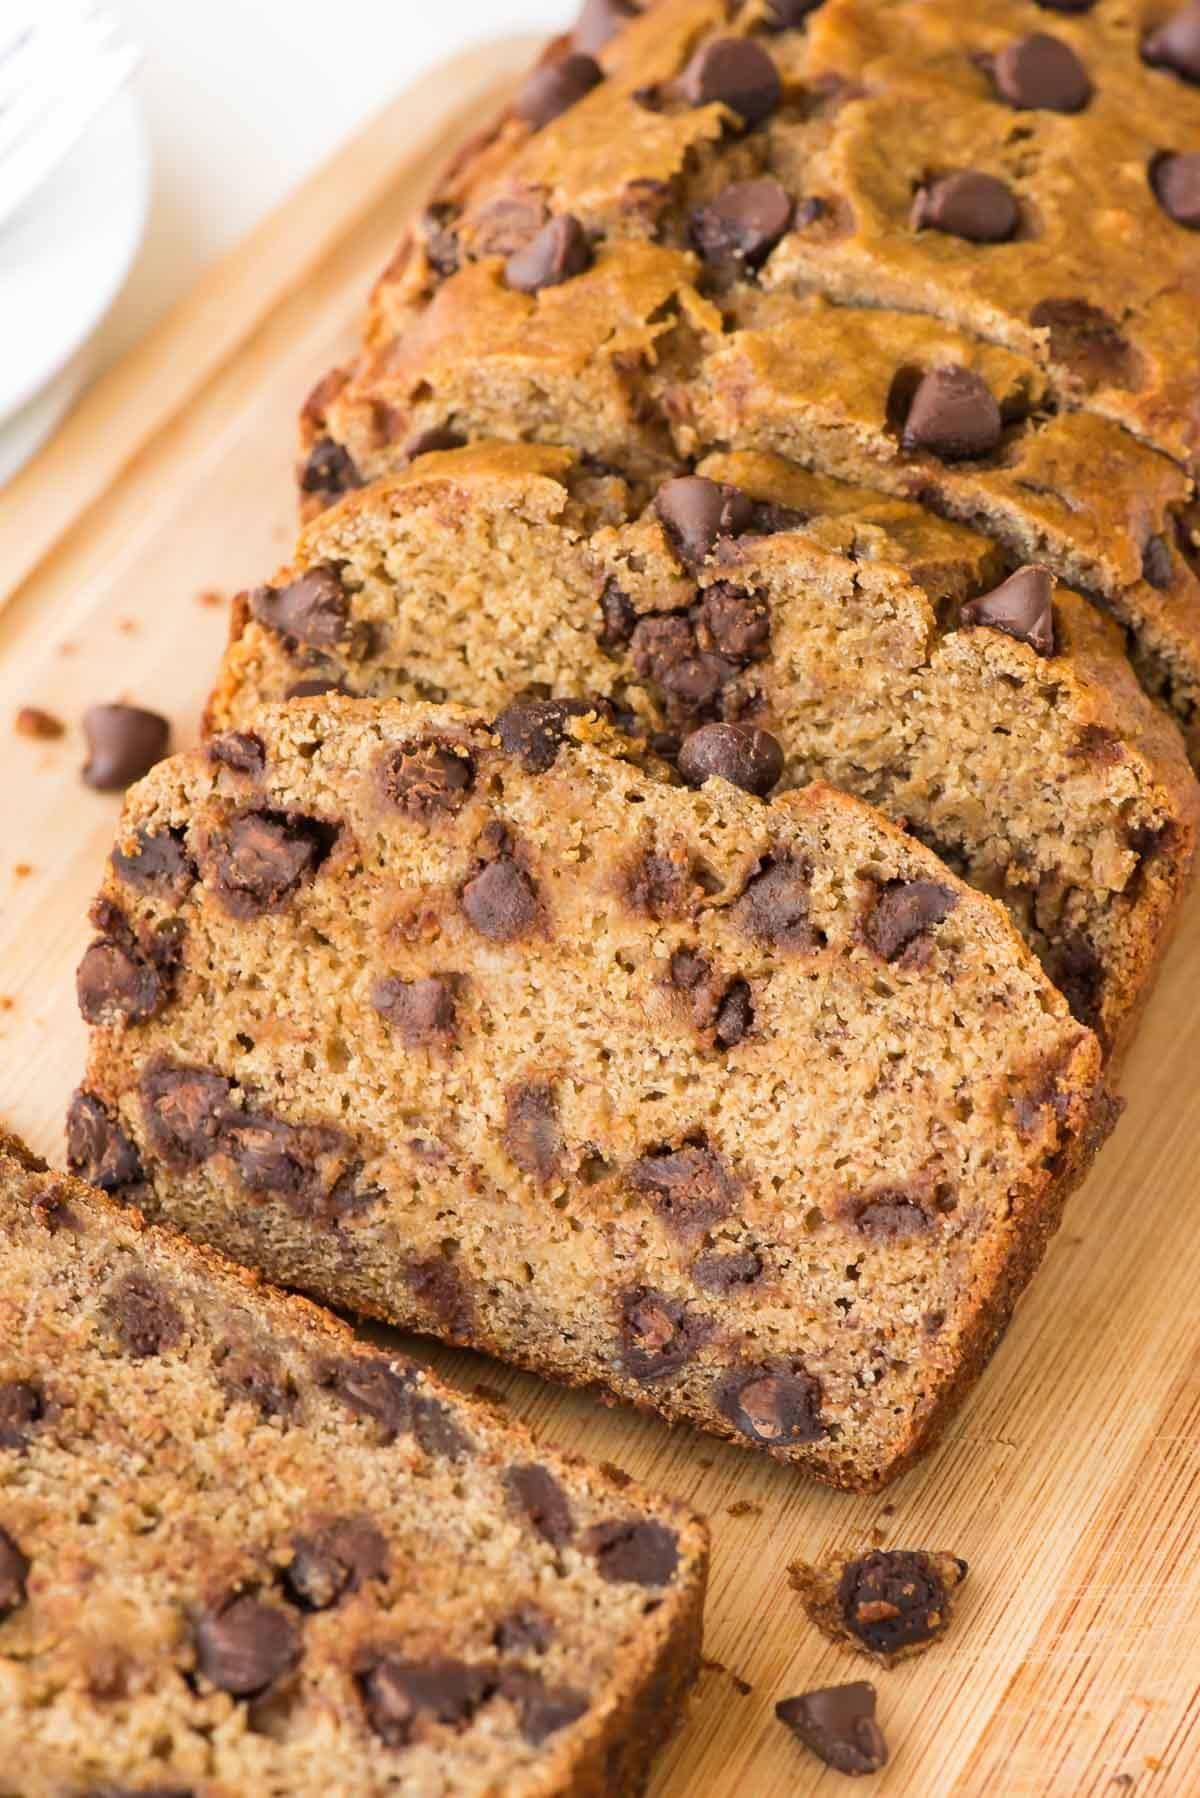 Healthy-Banana-Bread-Recipe-with-Chocolate-Chips.jpg